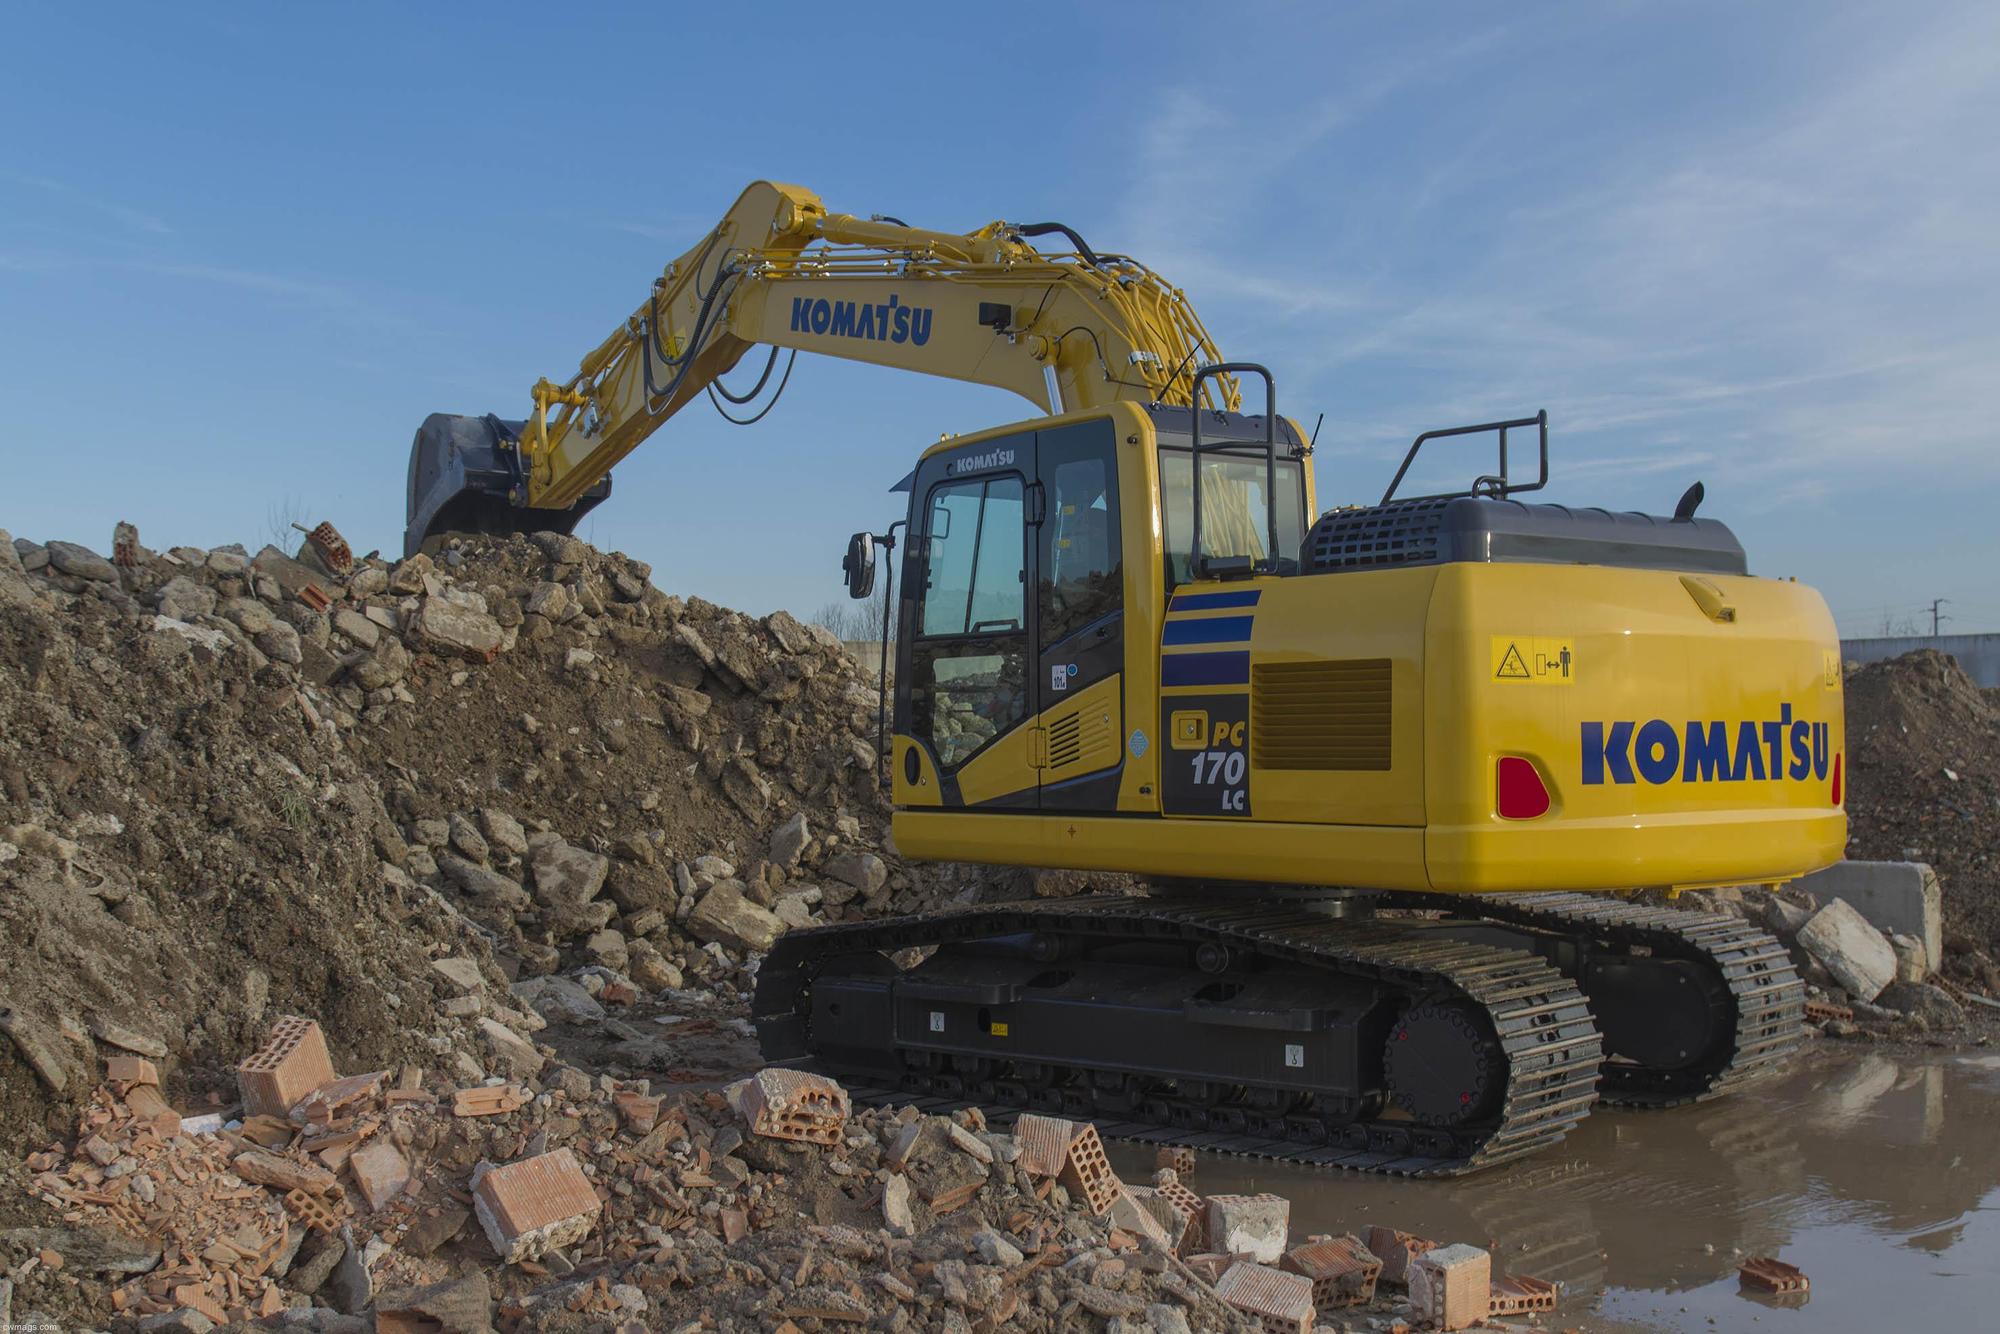 Komatsu PC170LC Excavator